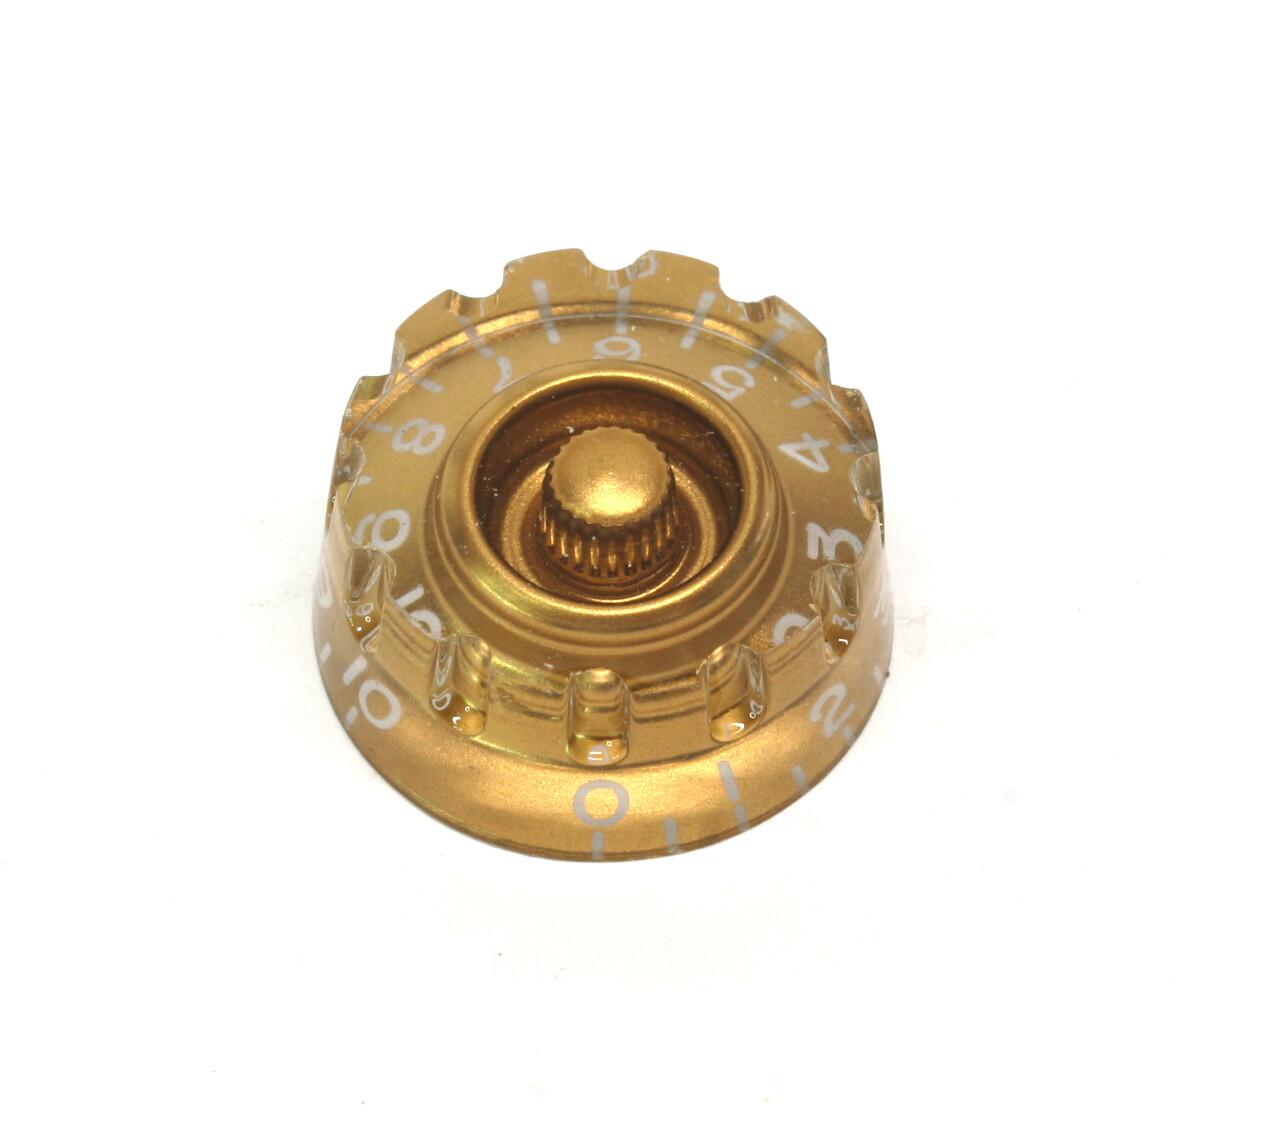 Gold Speed knobs *Knurled vintage style numbers, fits USA split shaft pots.